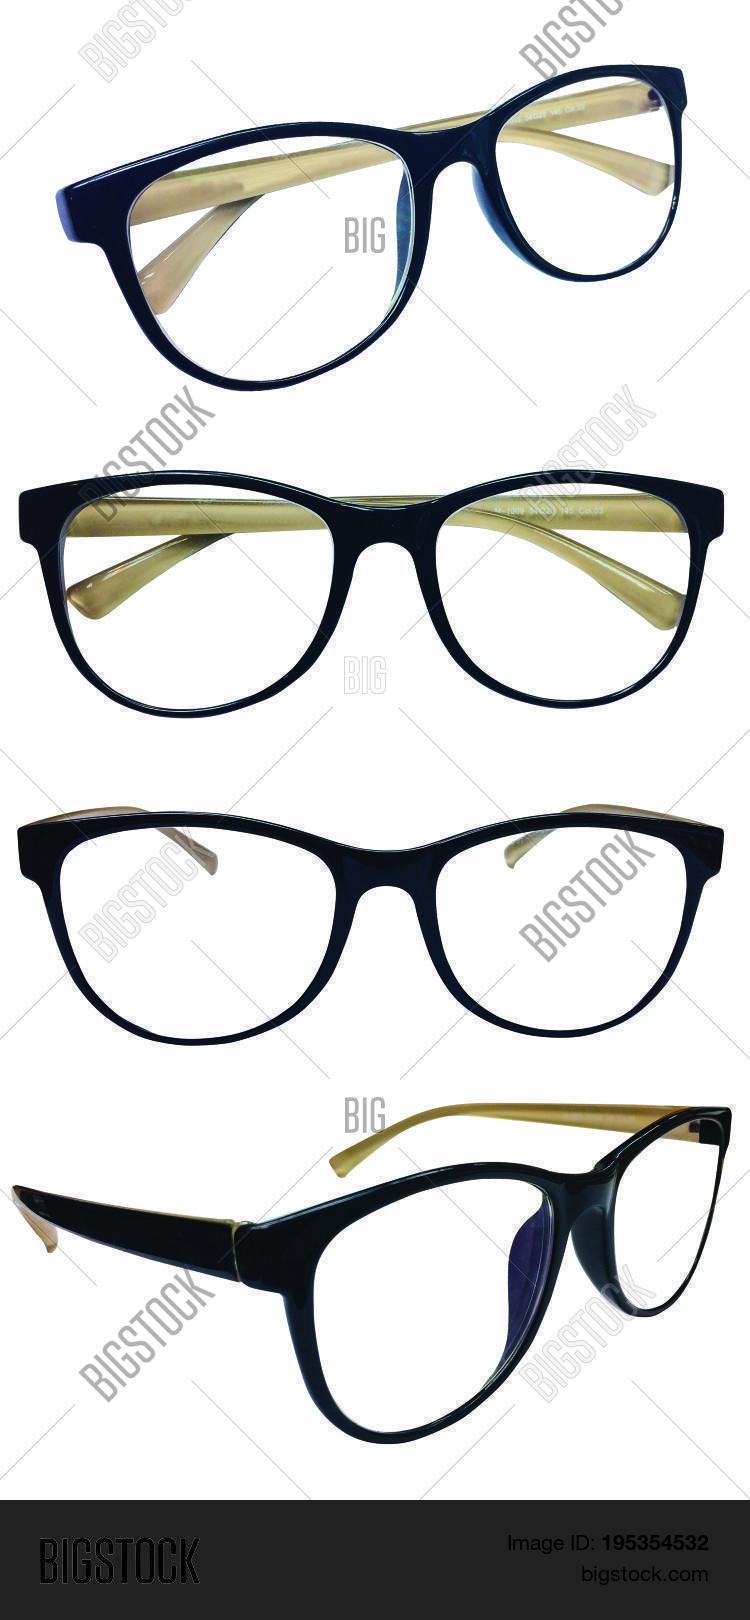 Set Eyeglass Frames, Black, Brown Image & Photo   Bigstock